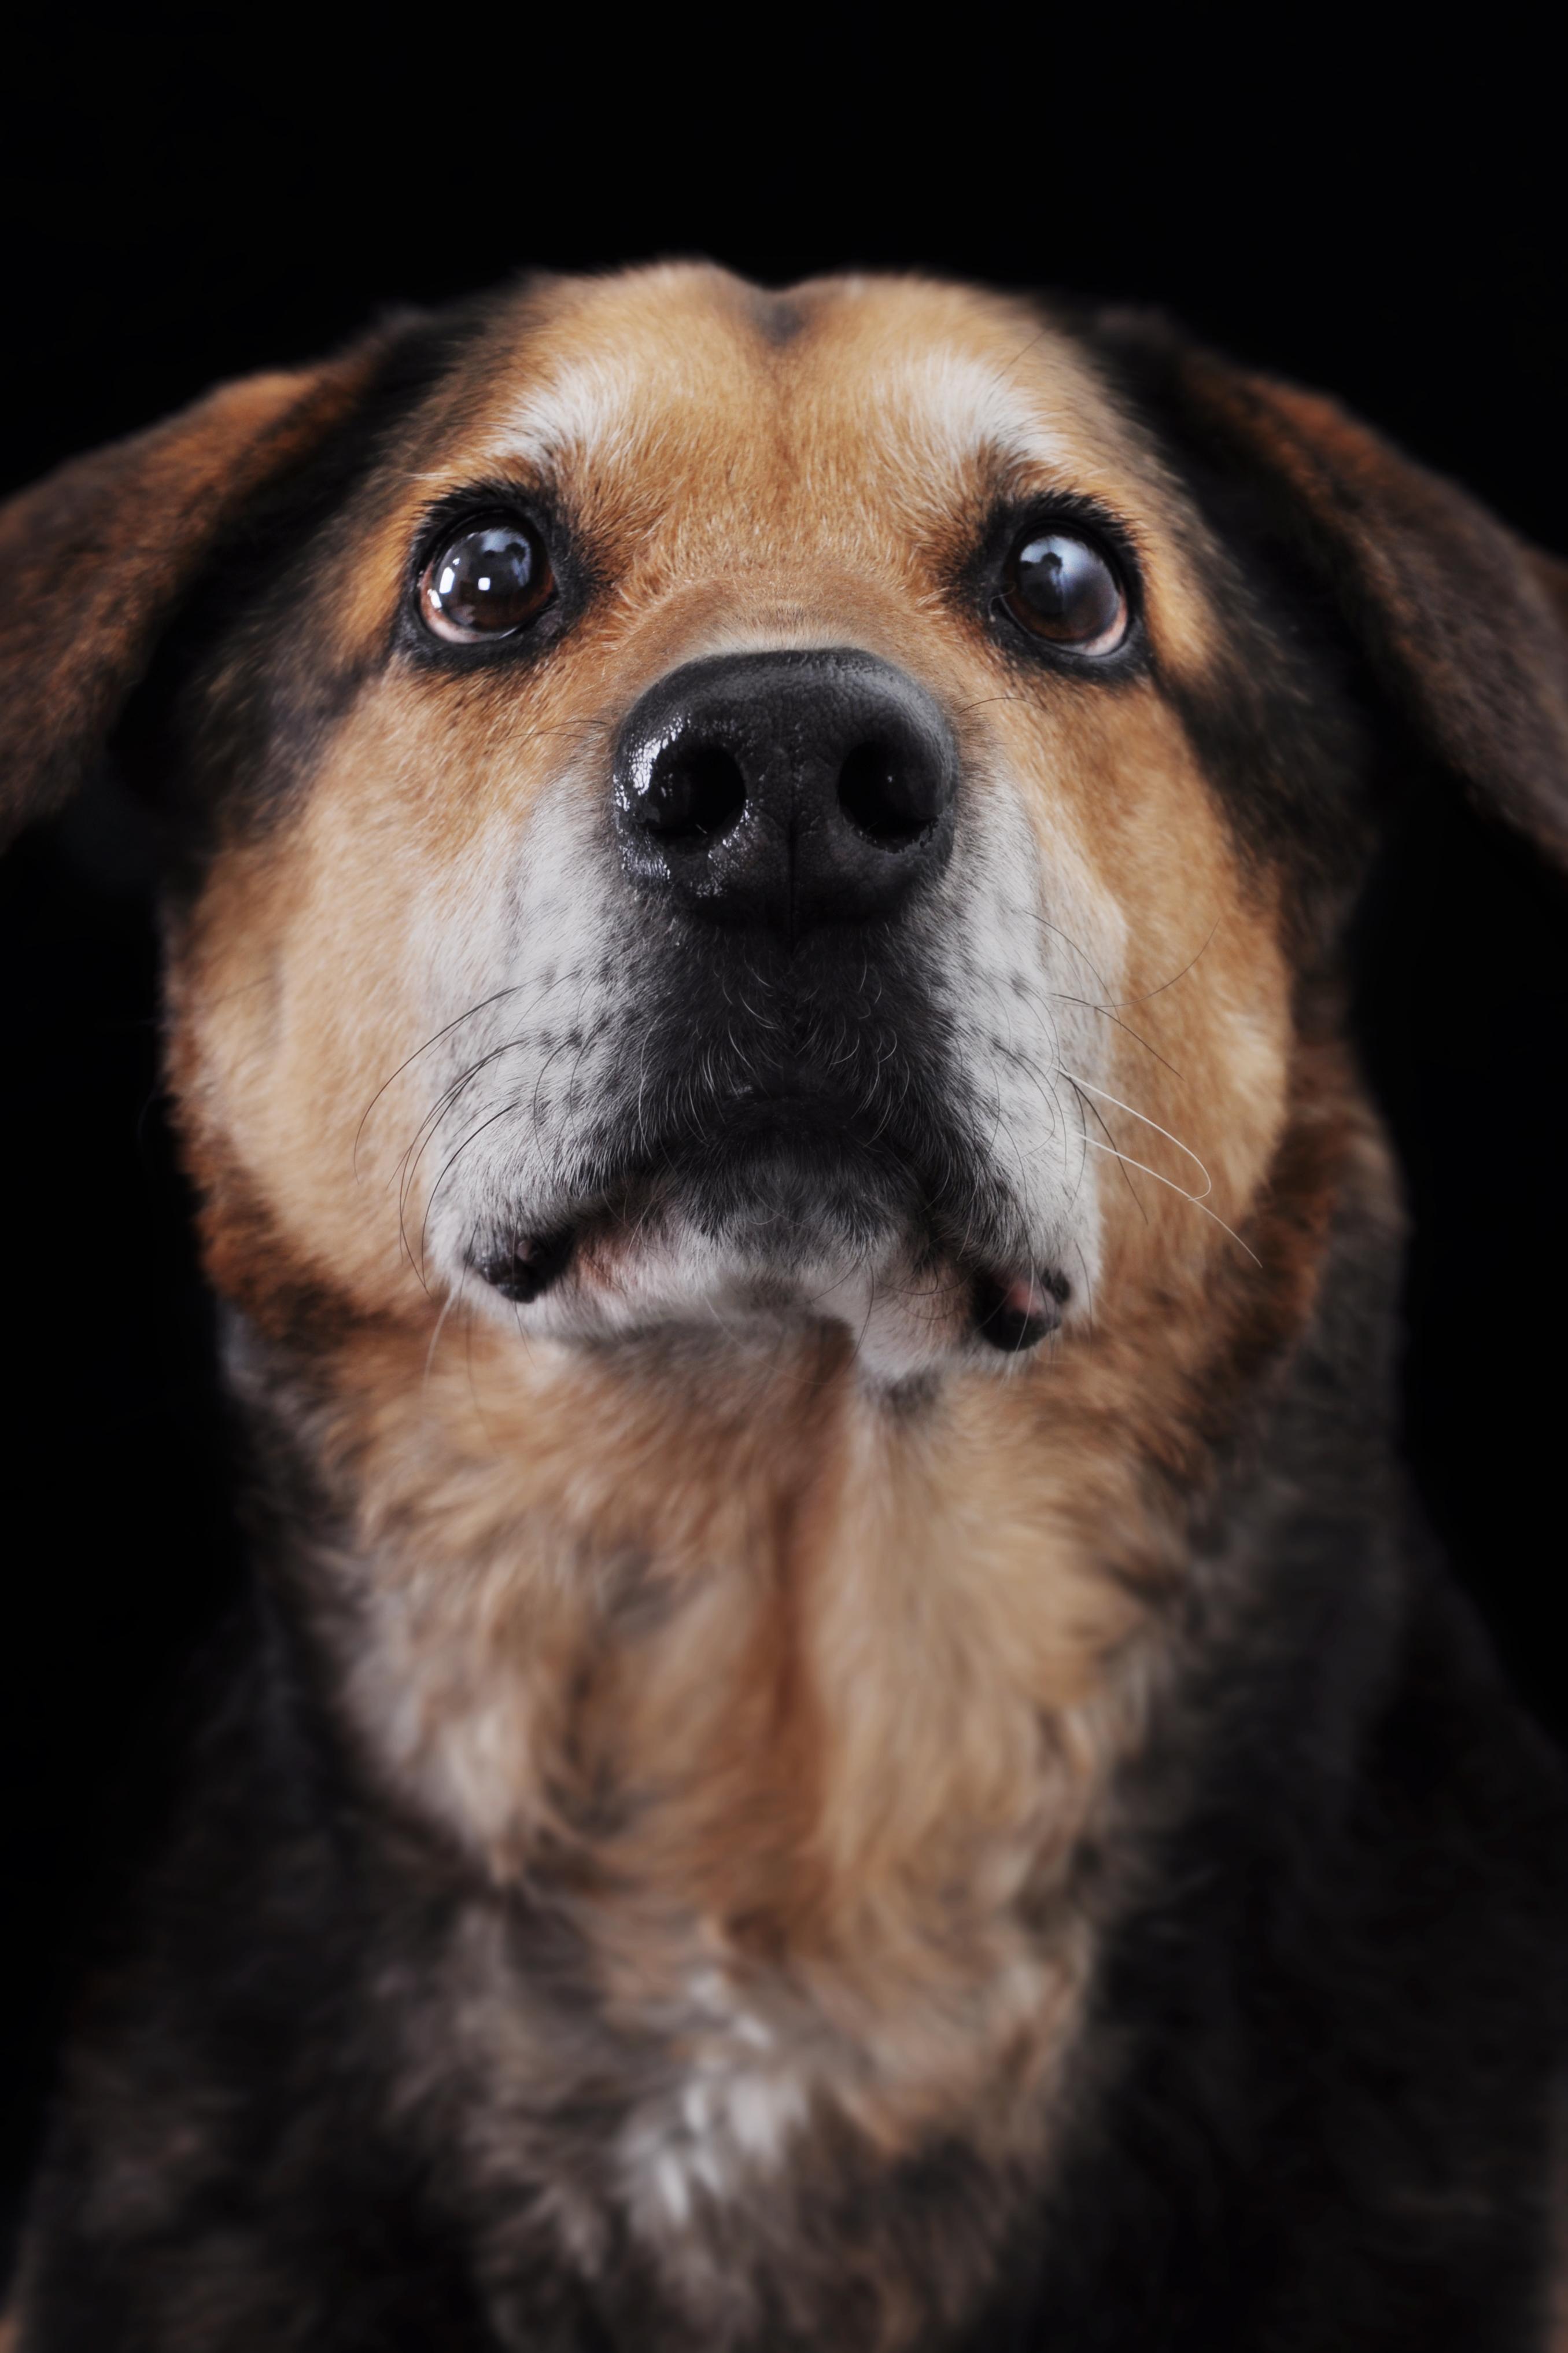 Portrait of a Dog, Animal, Blackbackground, Closeup, Cute, HQ Photo